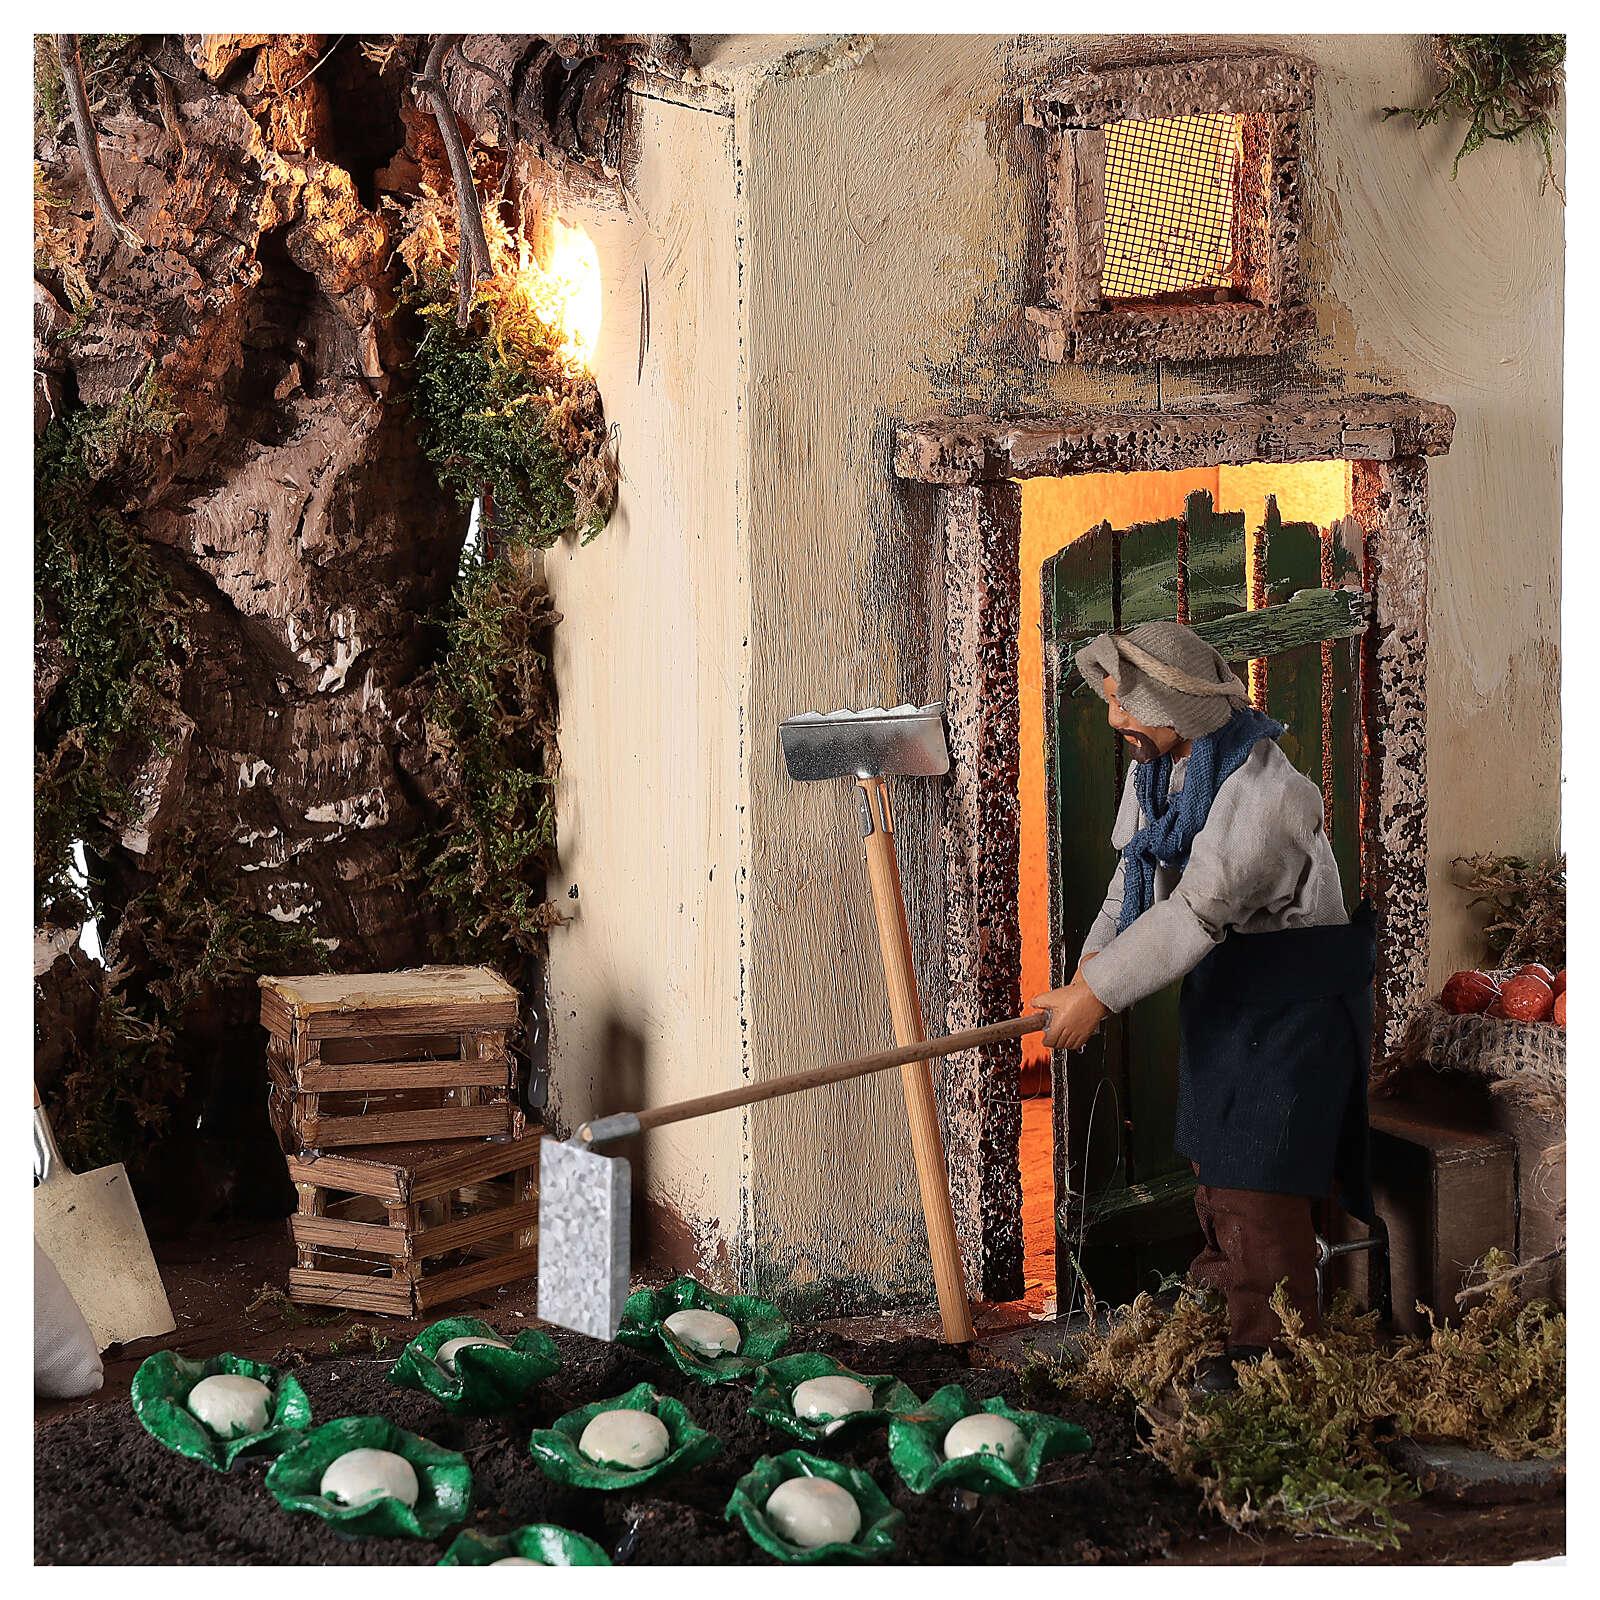 Movimiento campesino huerto belén Nápoles 12 cm 4